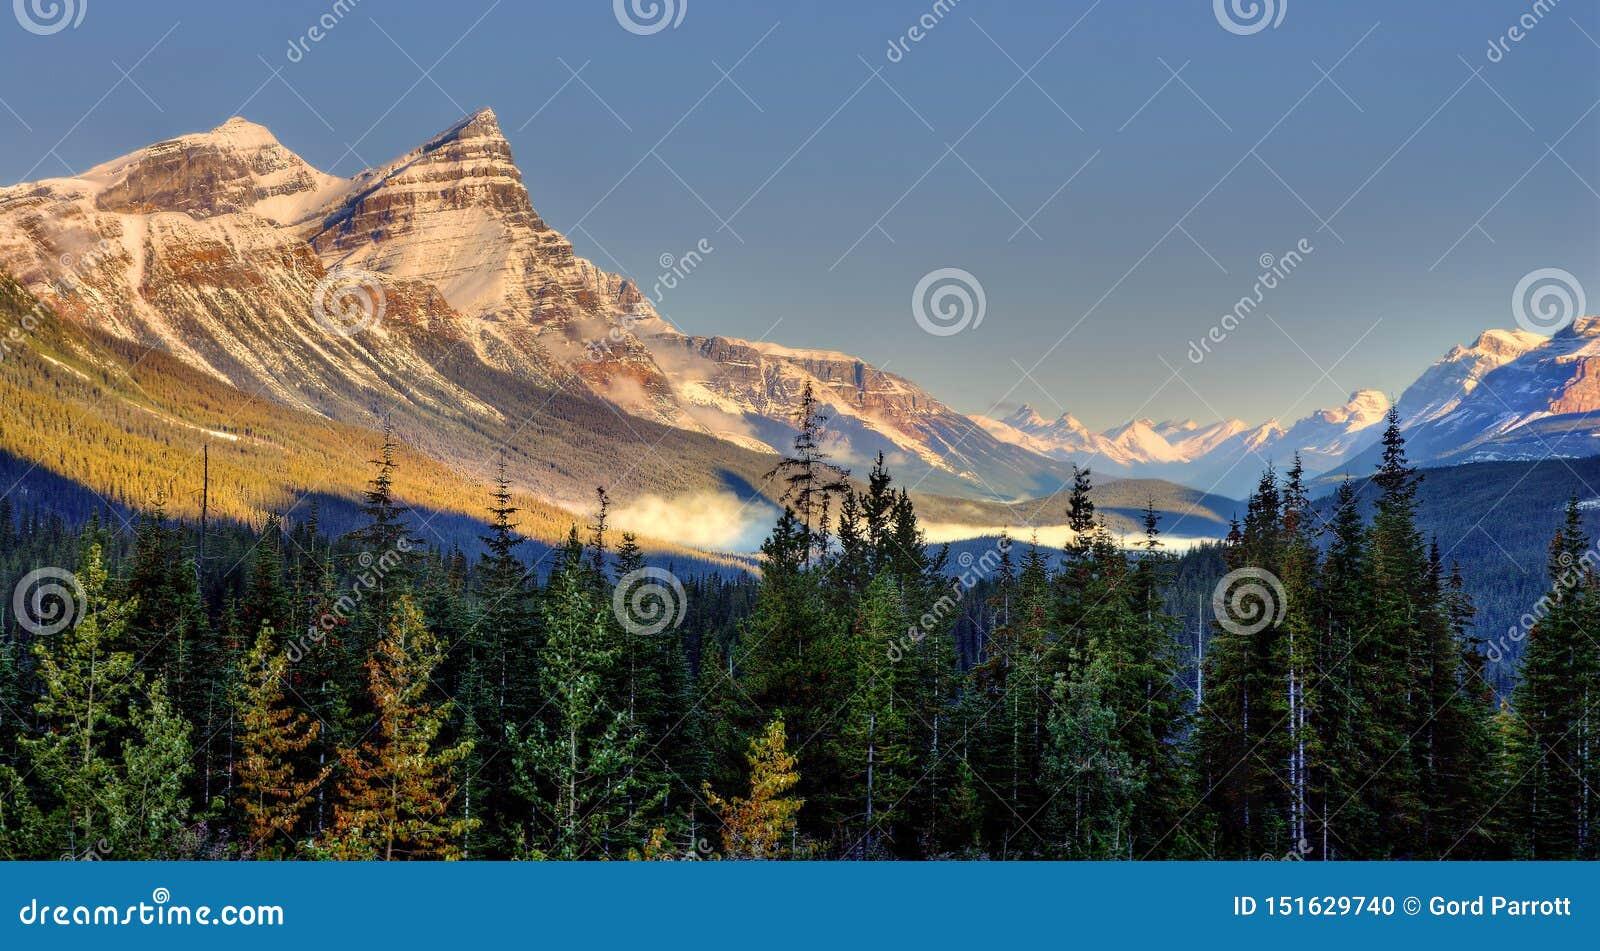 Amazing Alberta Landscape